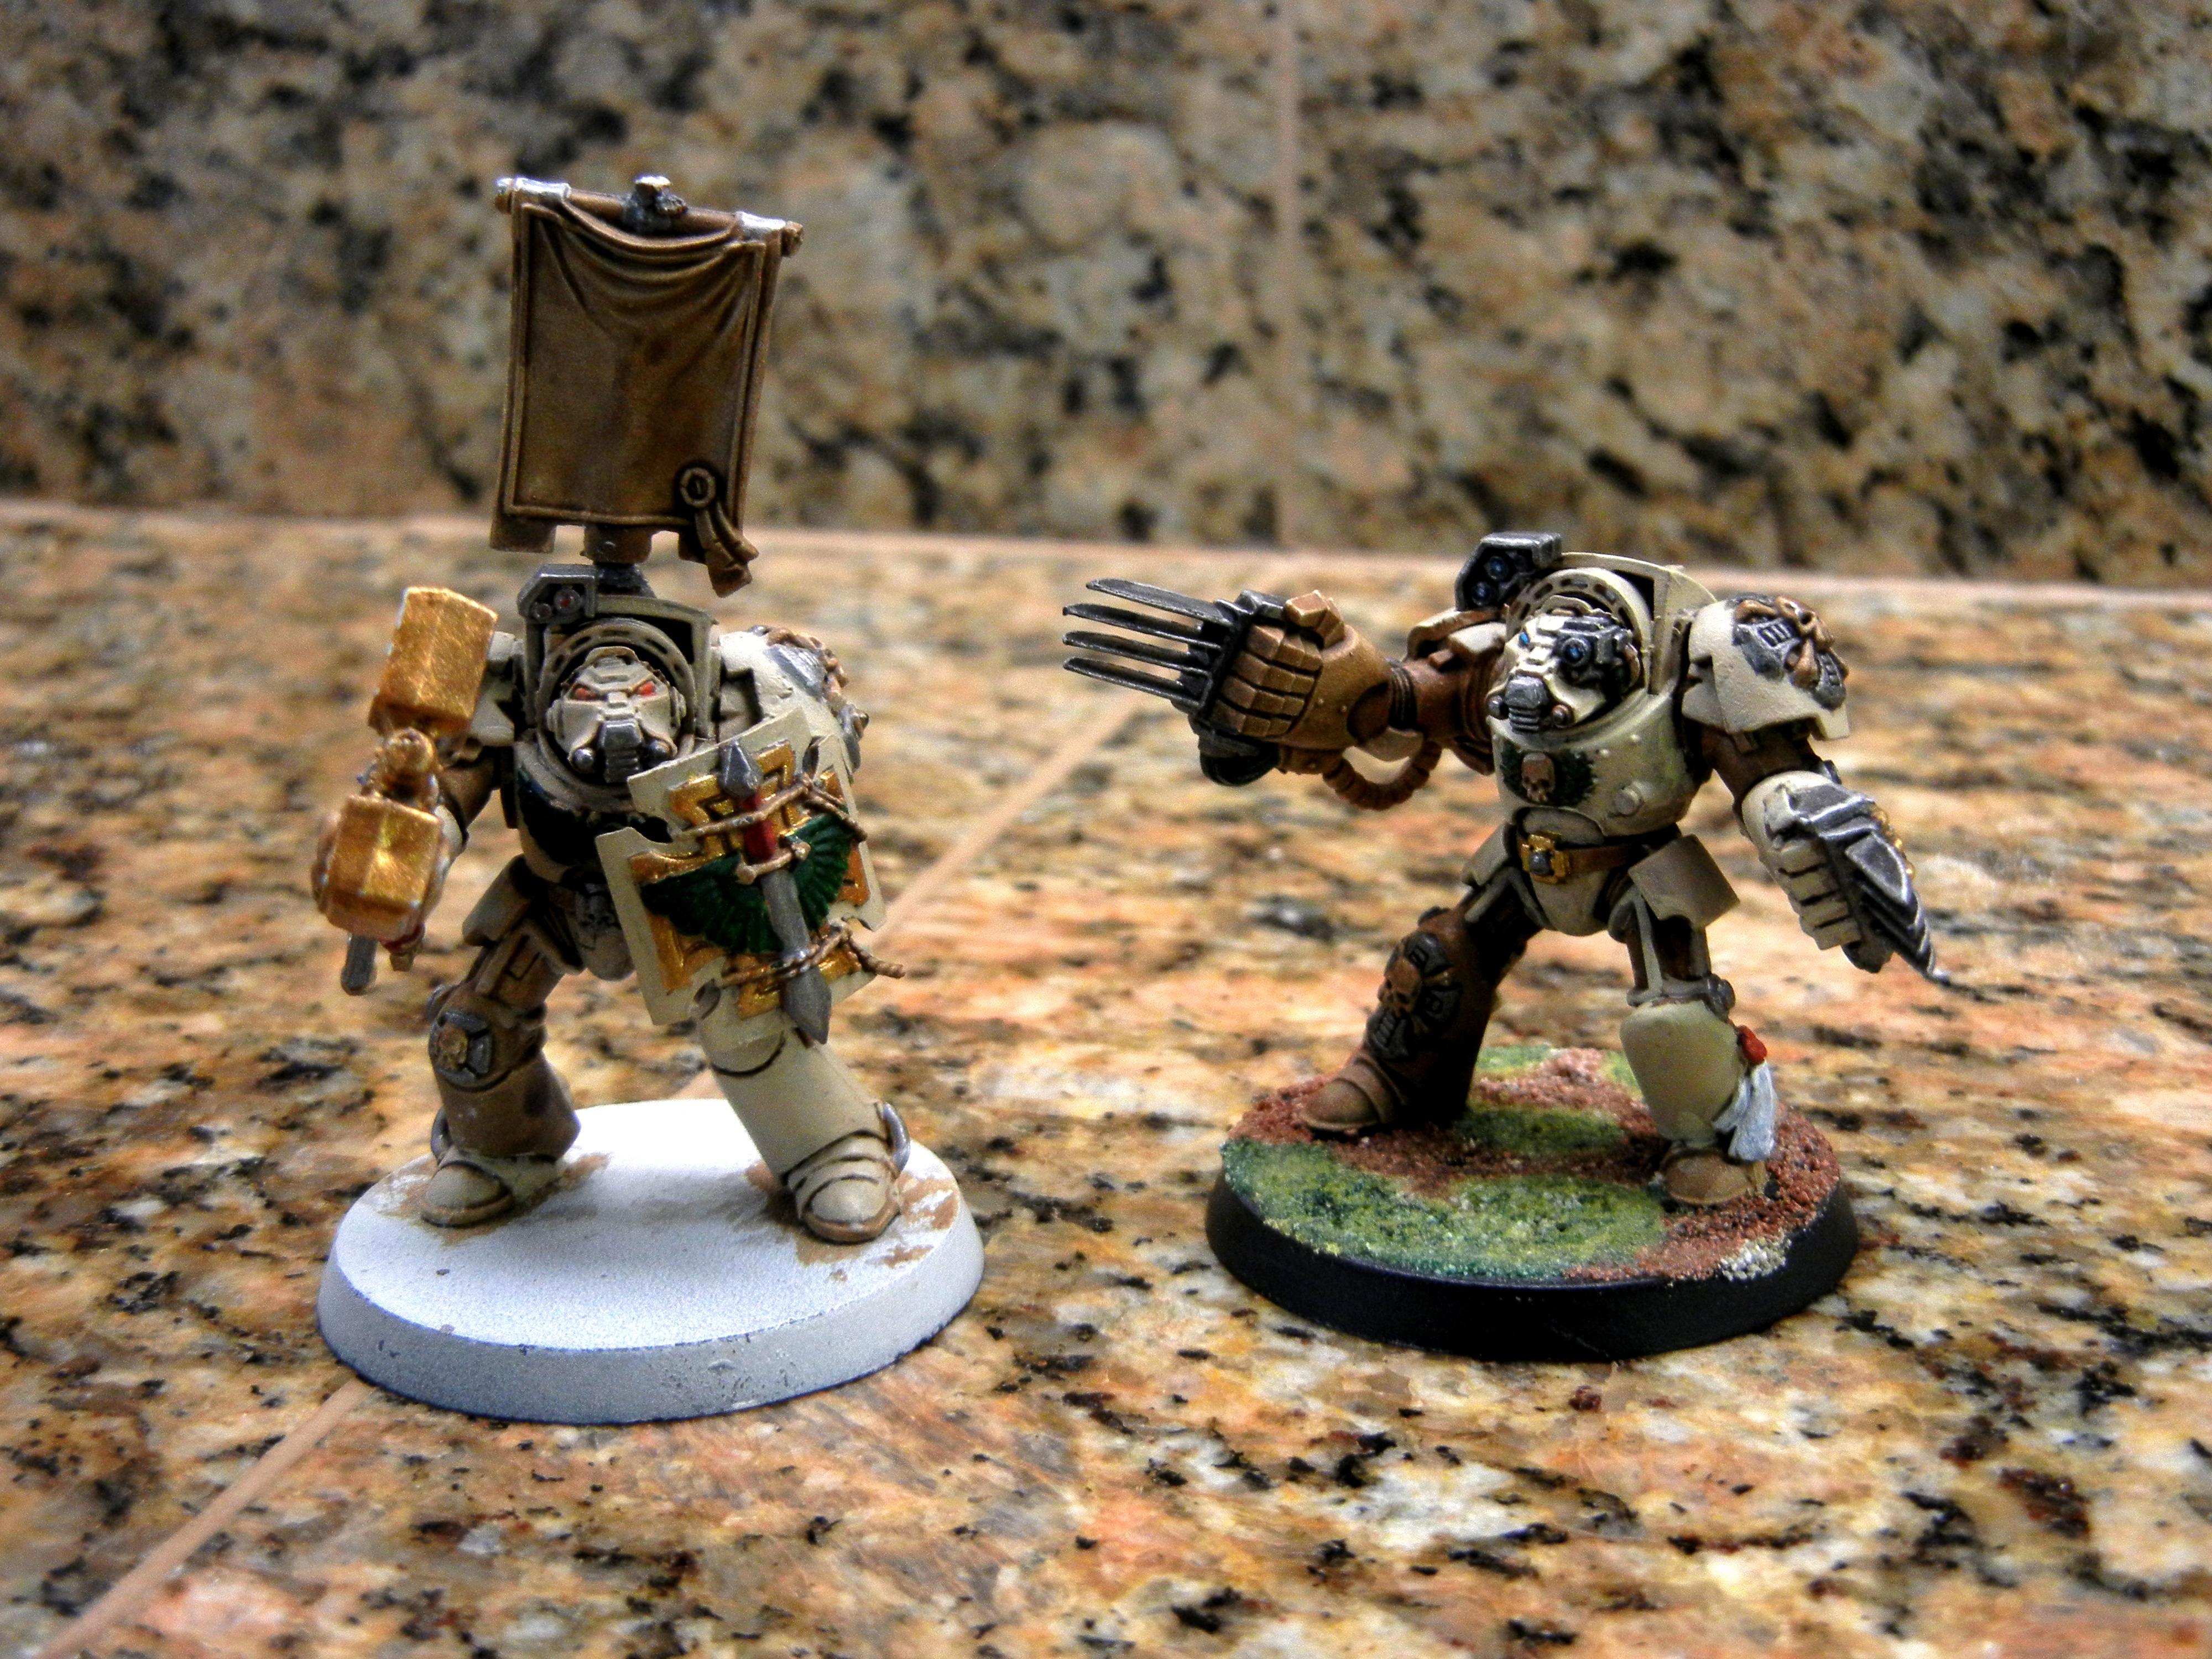 Terminator Armor, Some Painted Terminators